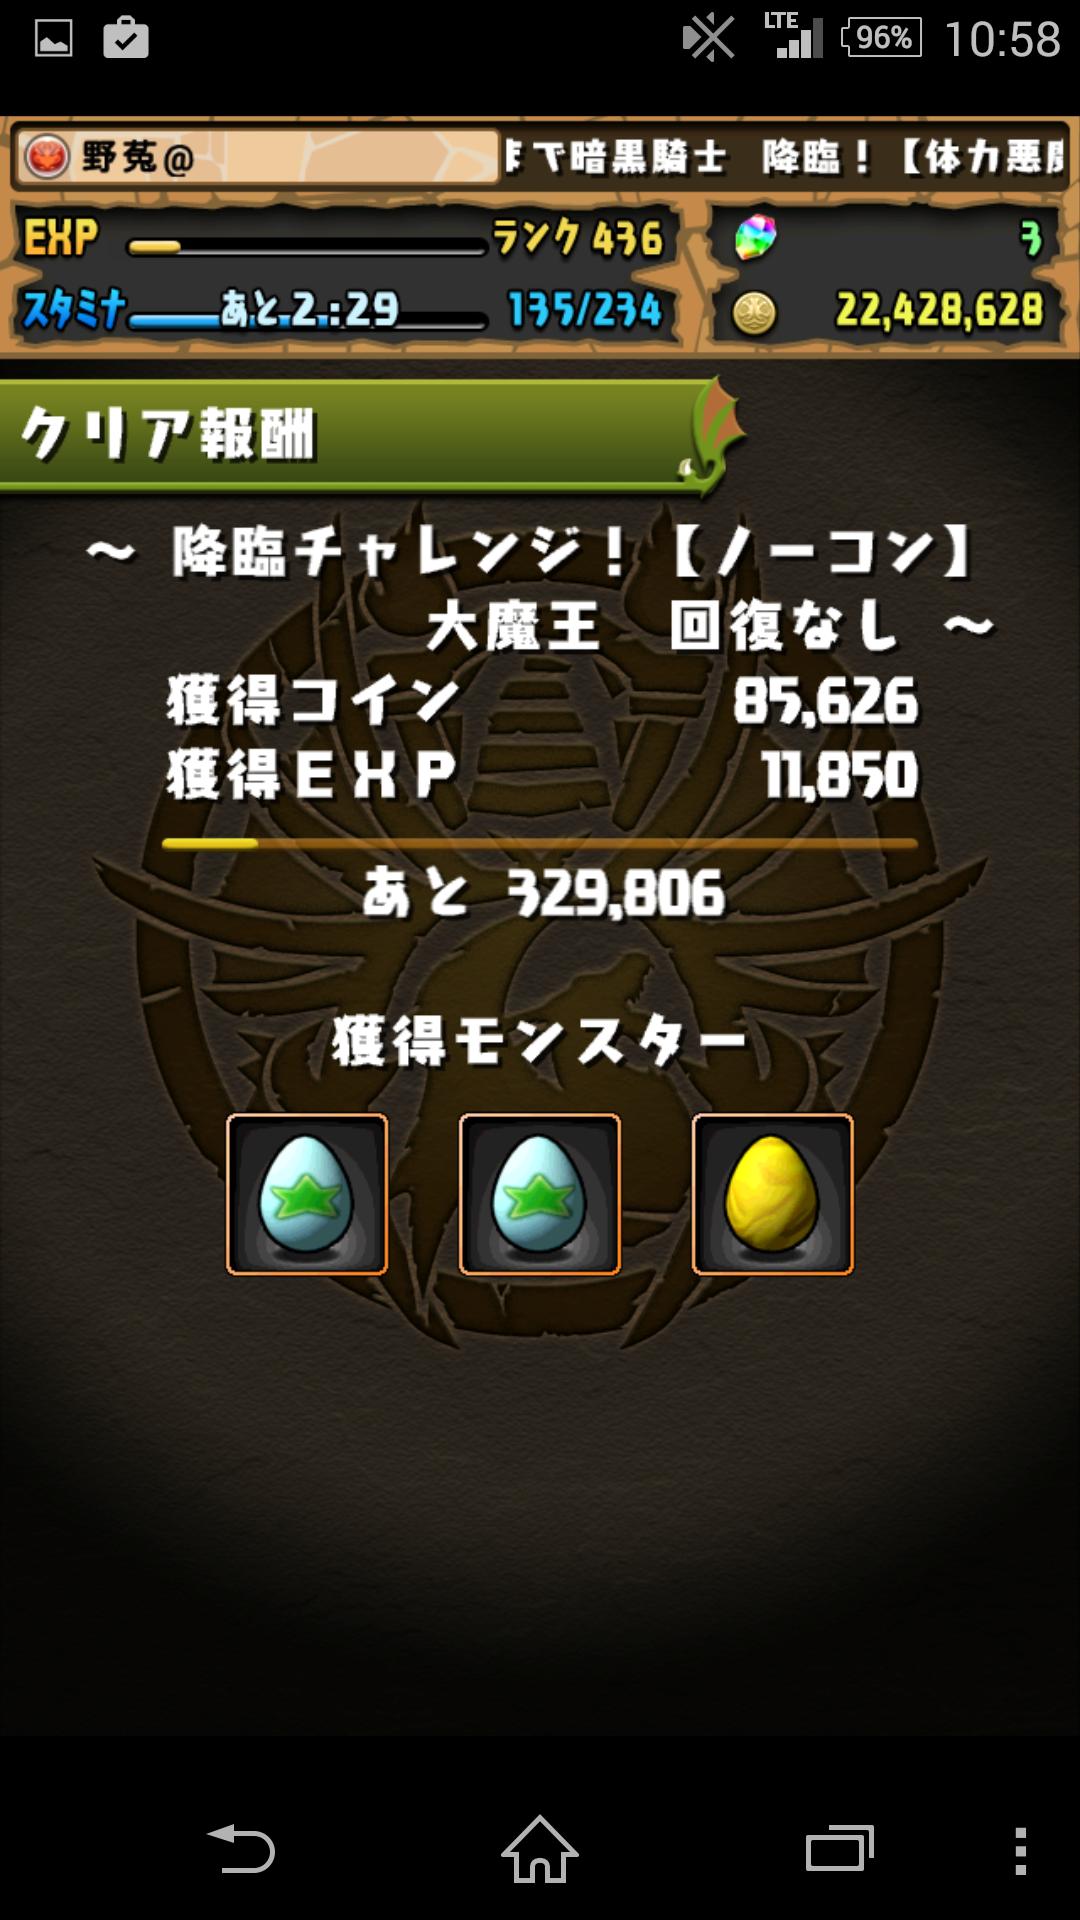 Screenshot_2014-12-22-10-58-57.png